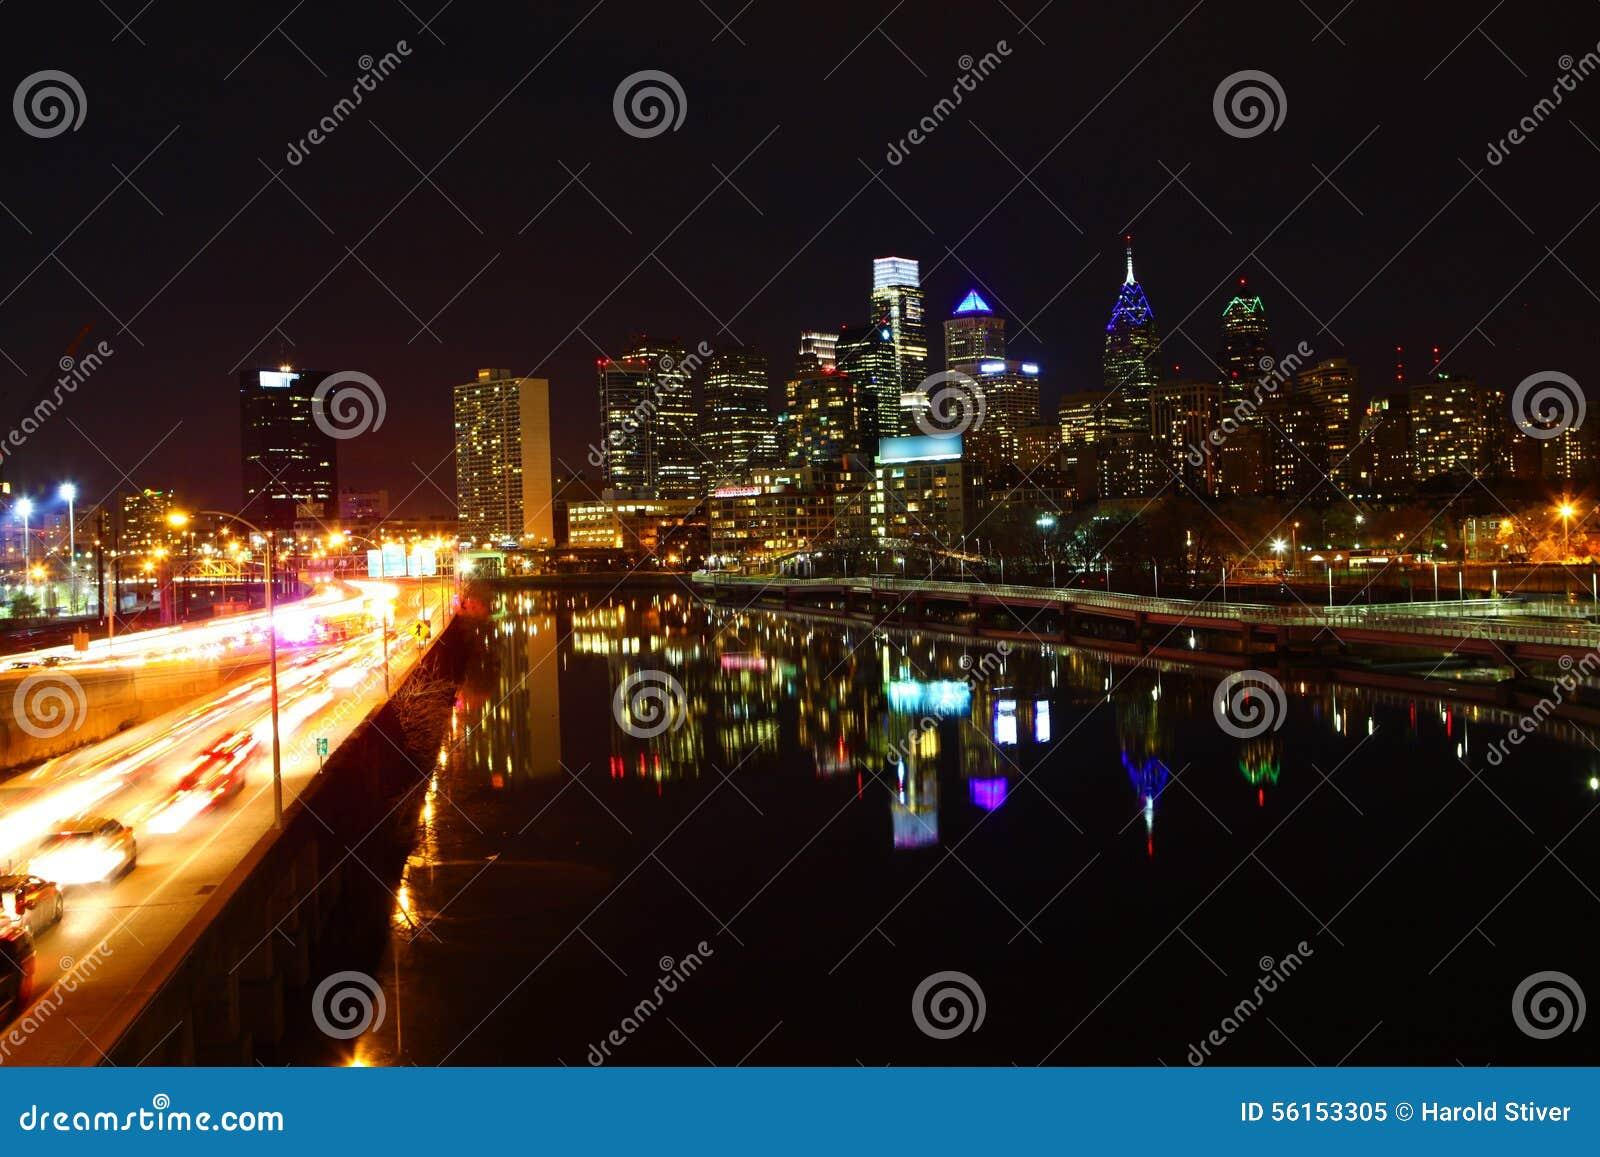 Night view of the Philadelphia City center